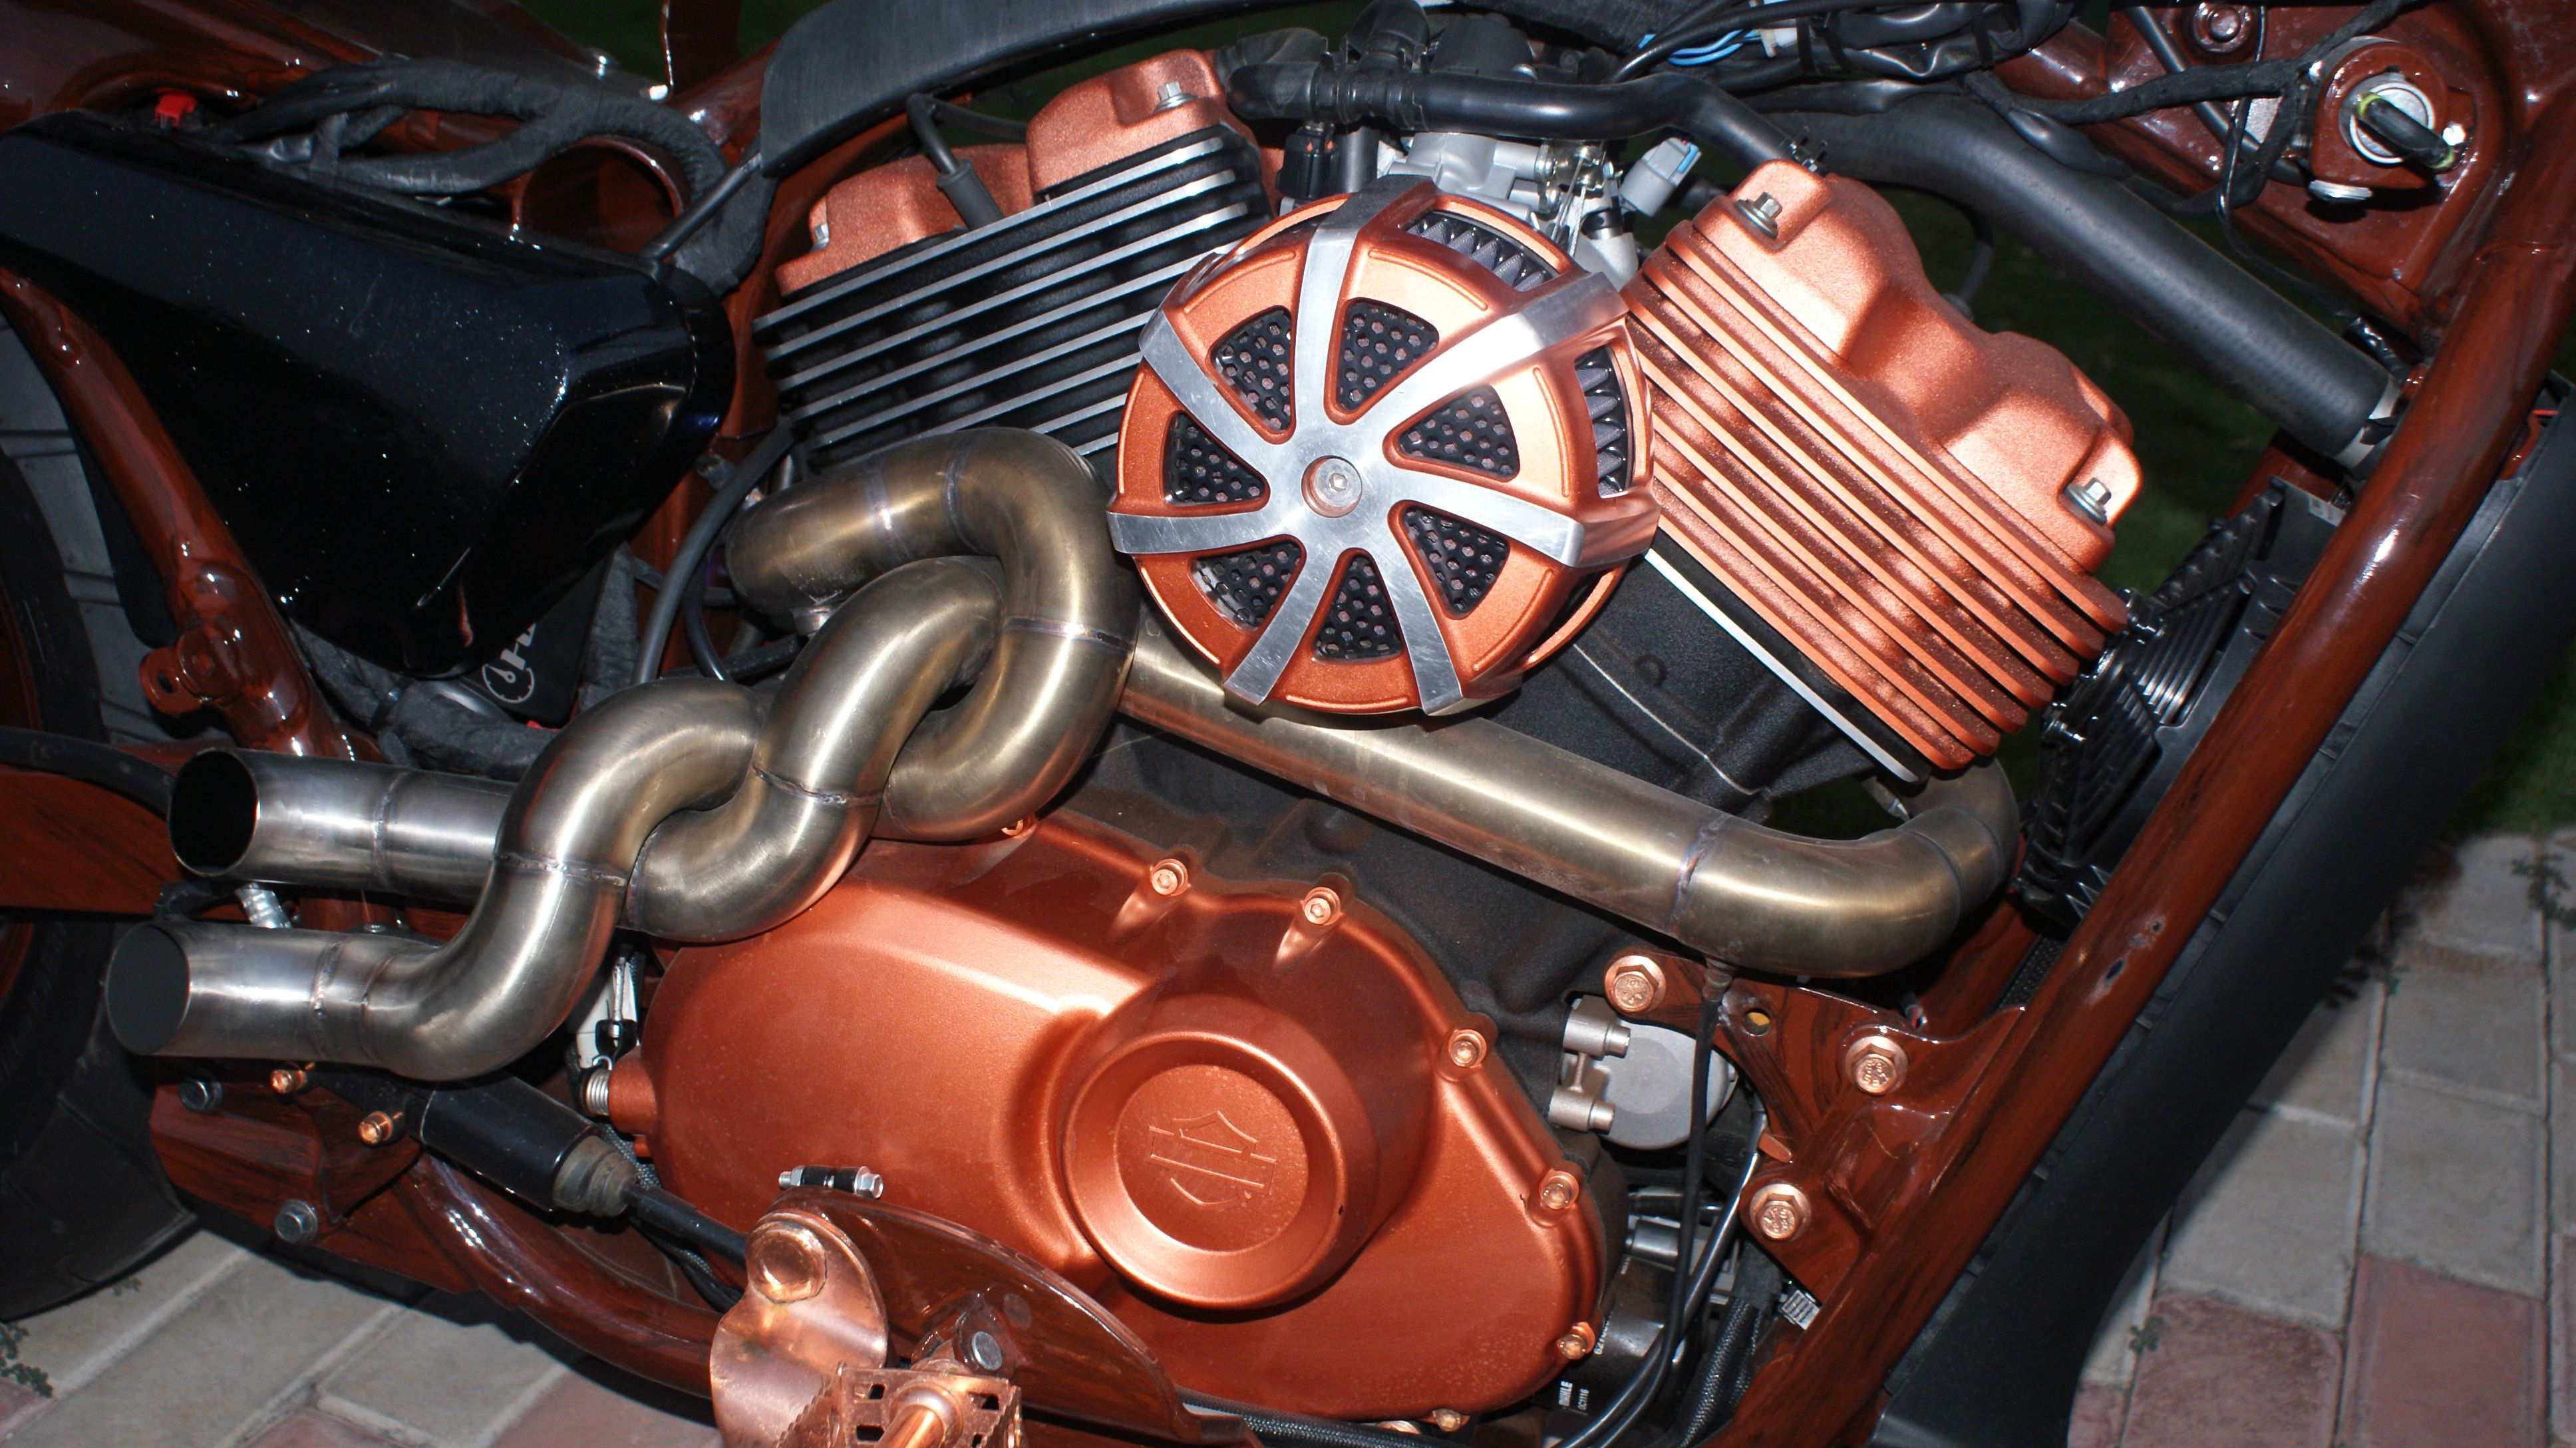 Twisted Exhaust | Custom Street 750 | Motorcycle exhaust, Motorcycle